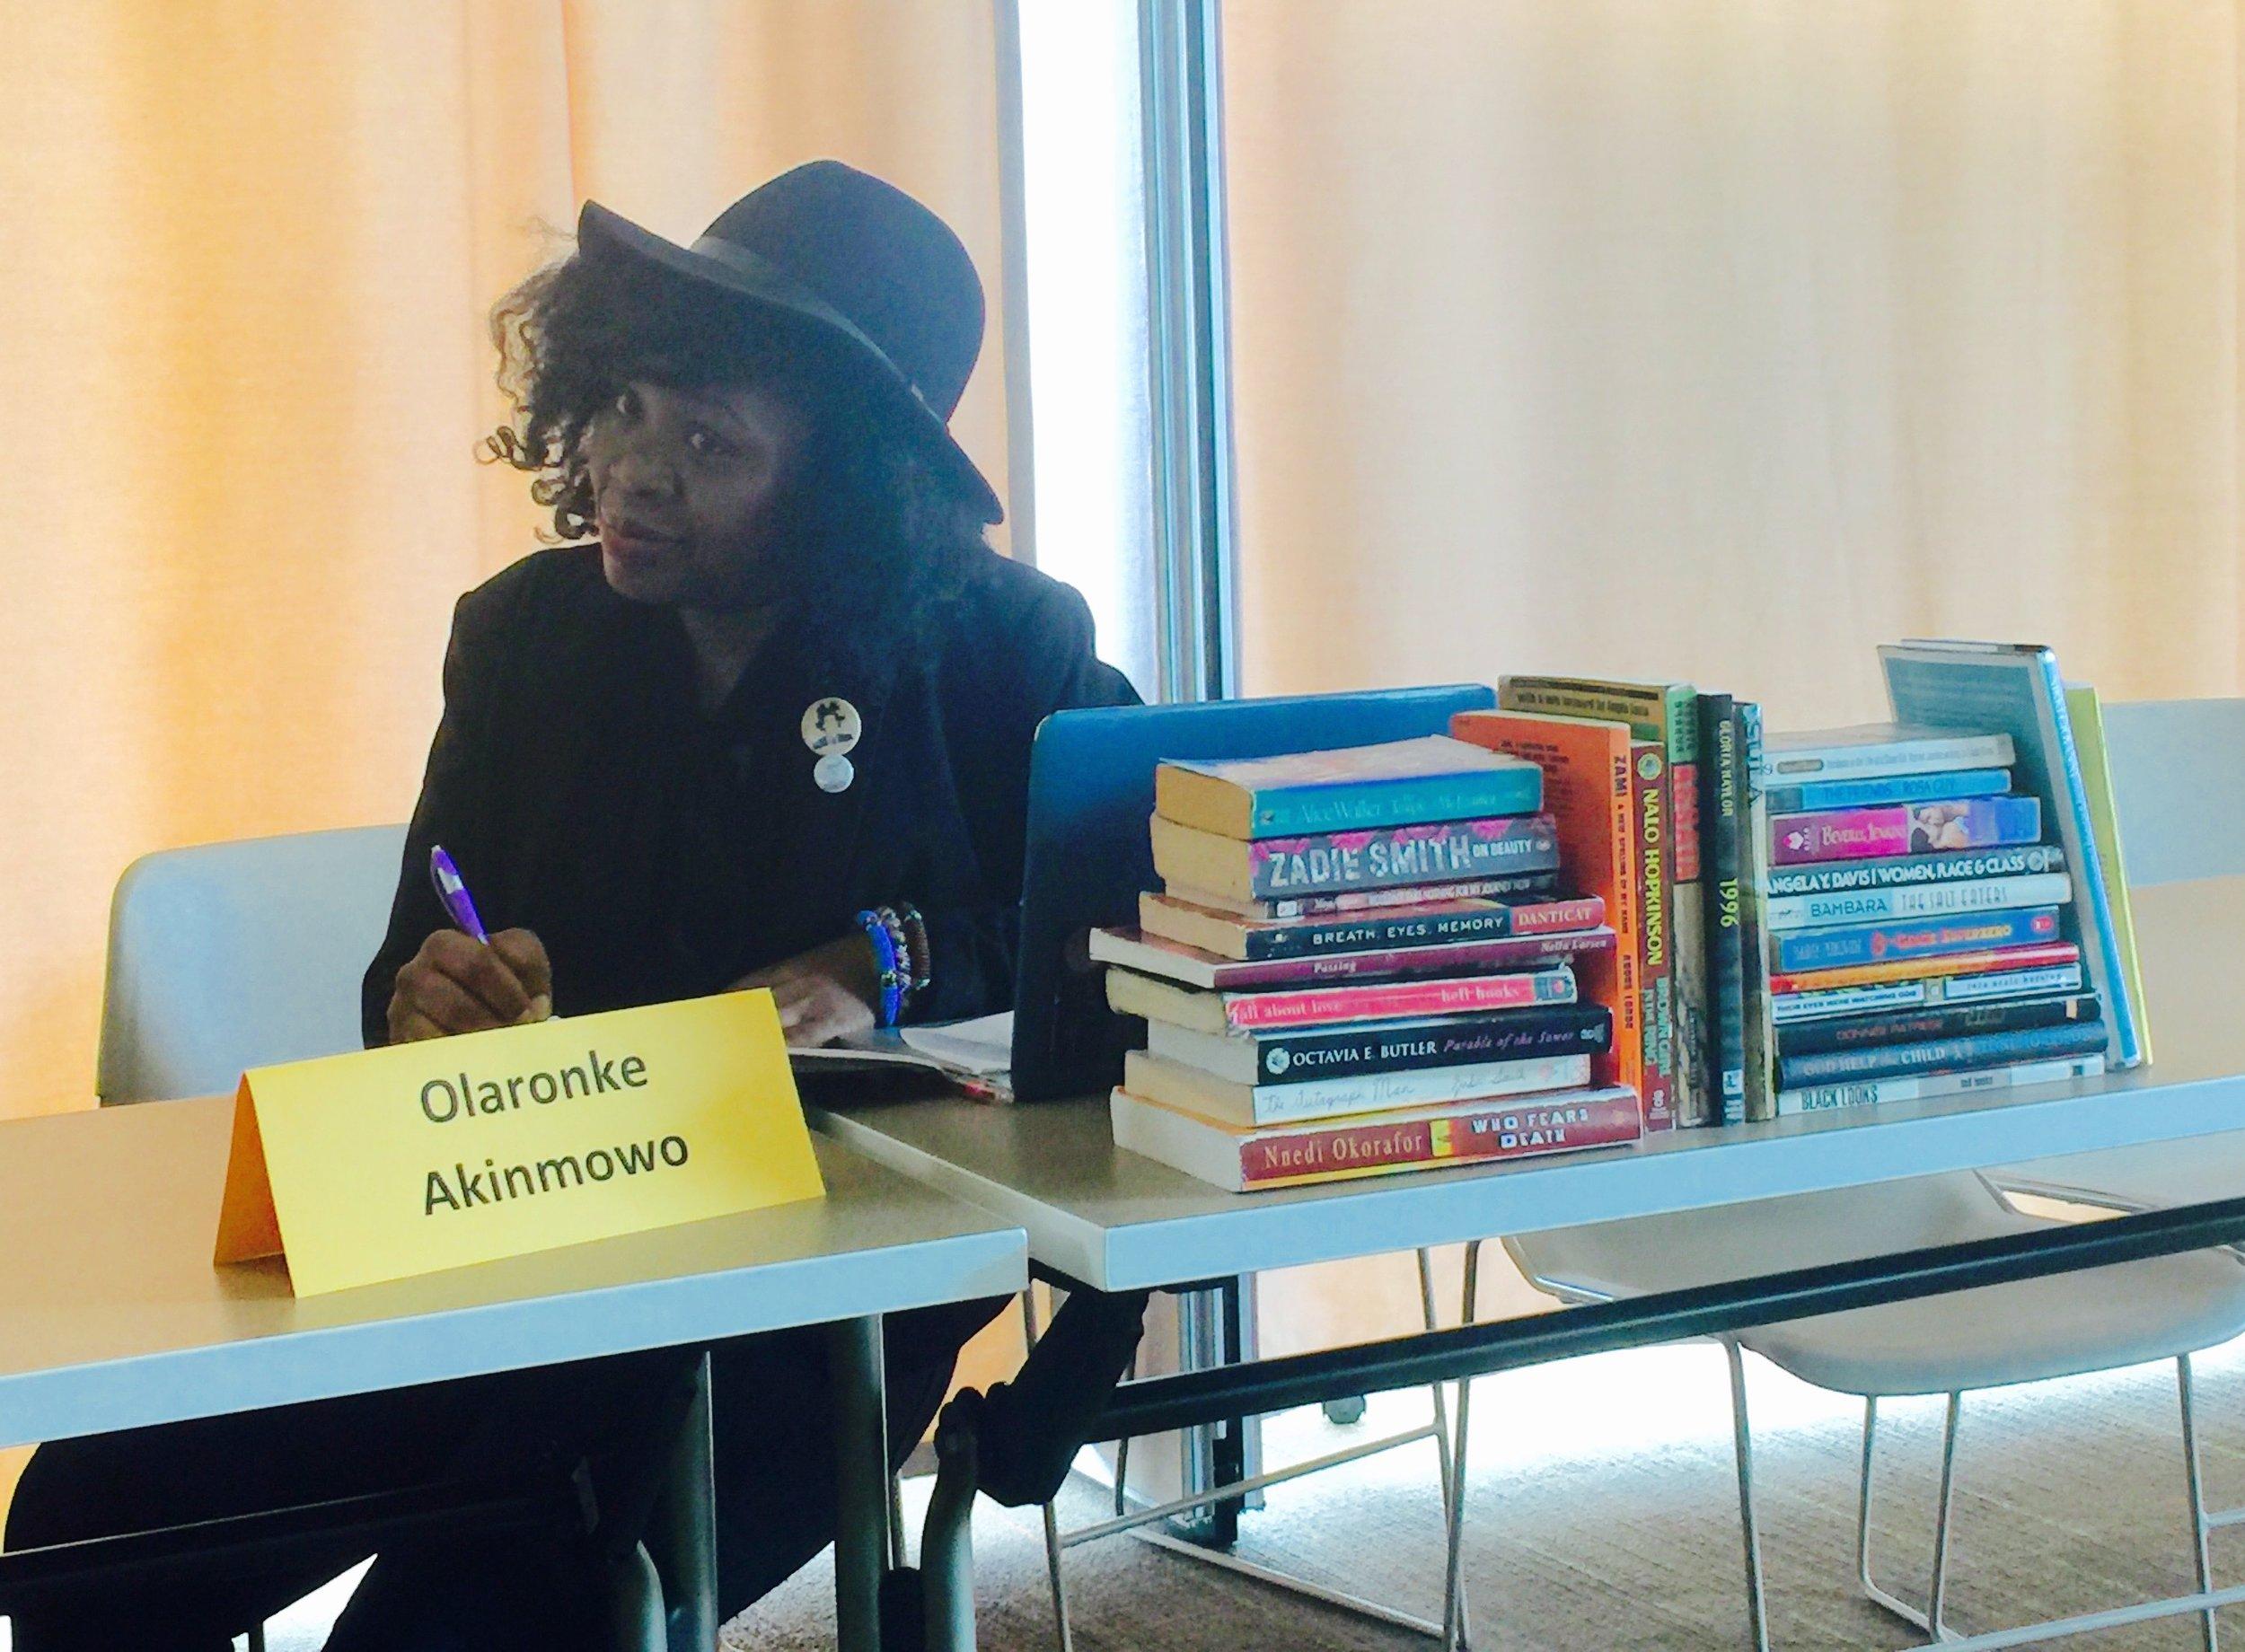 Olaronke Akinmowo with books.jpg